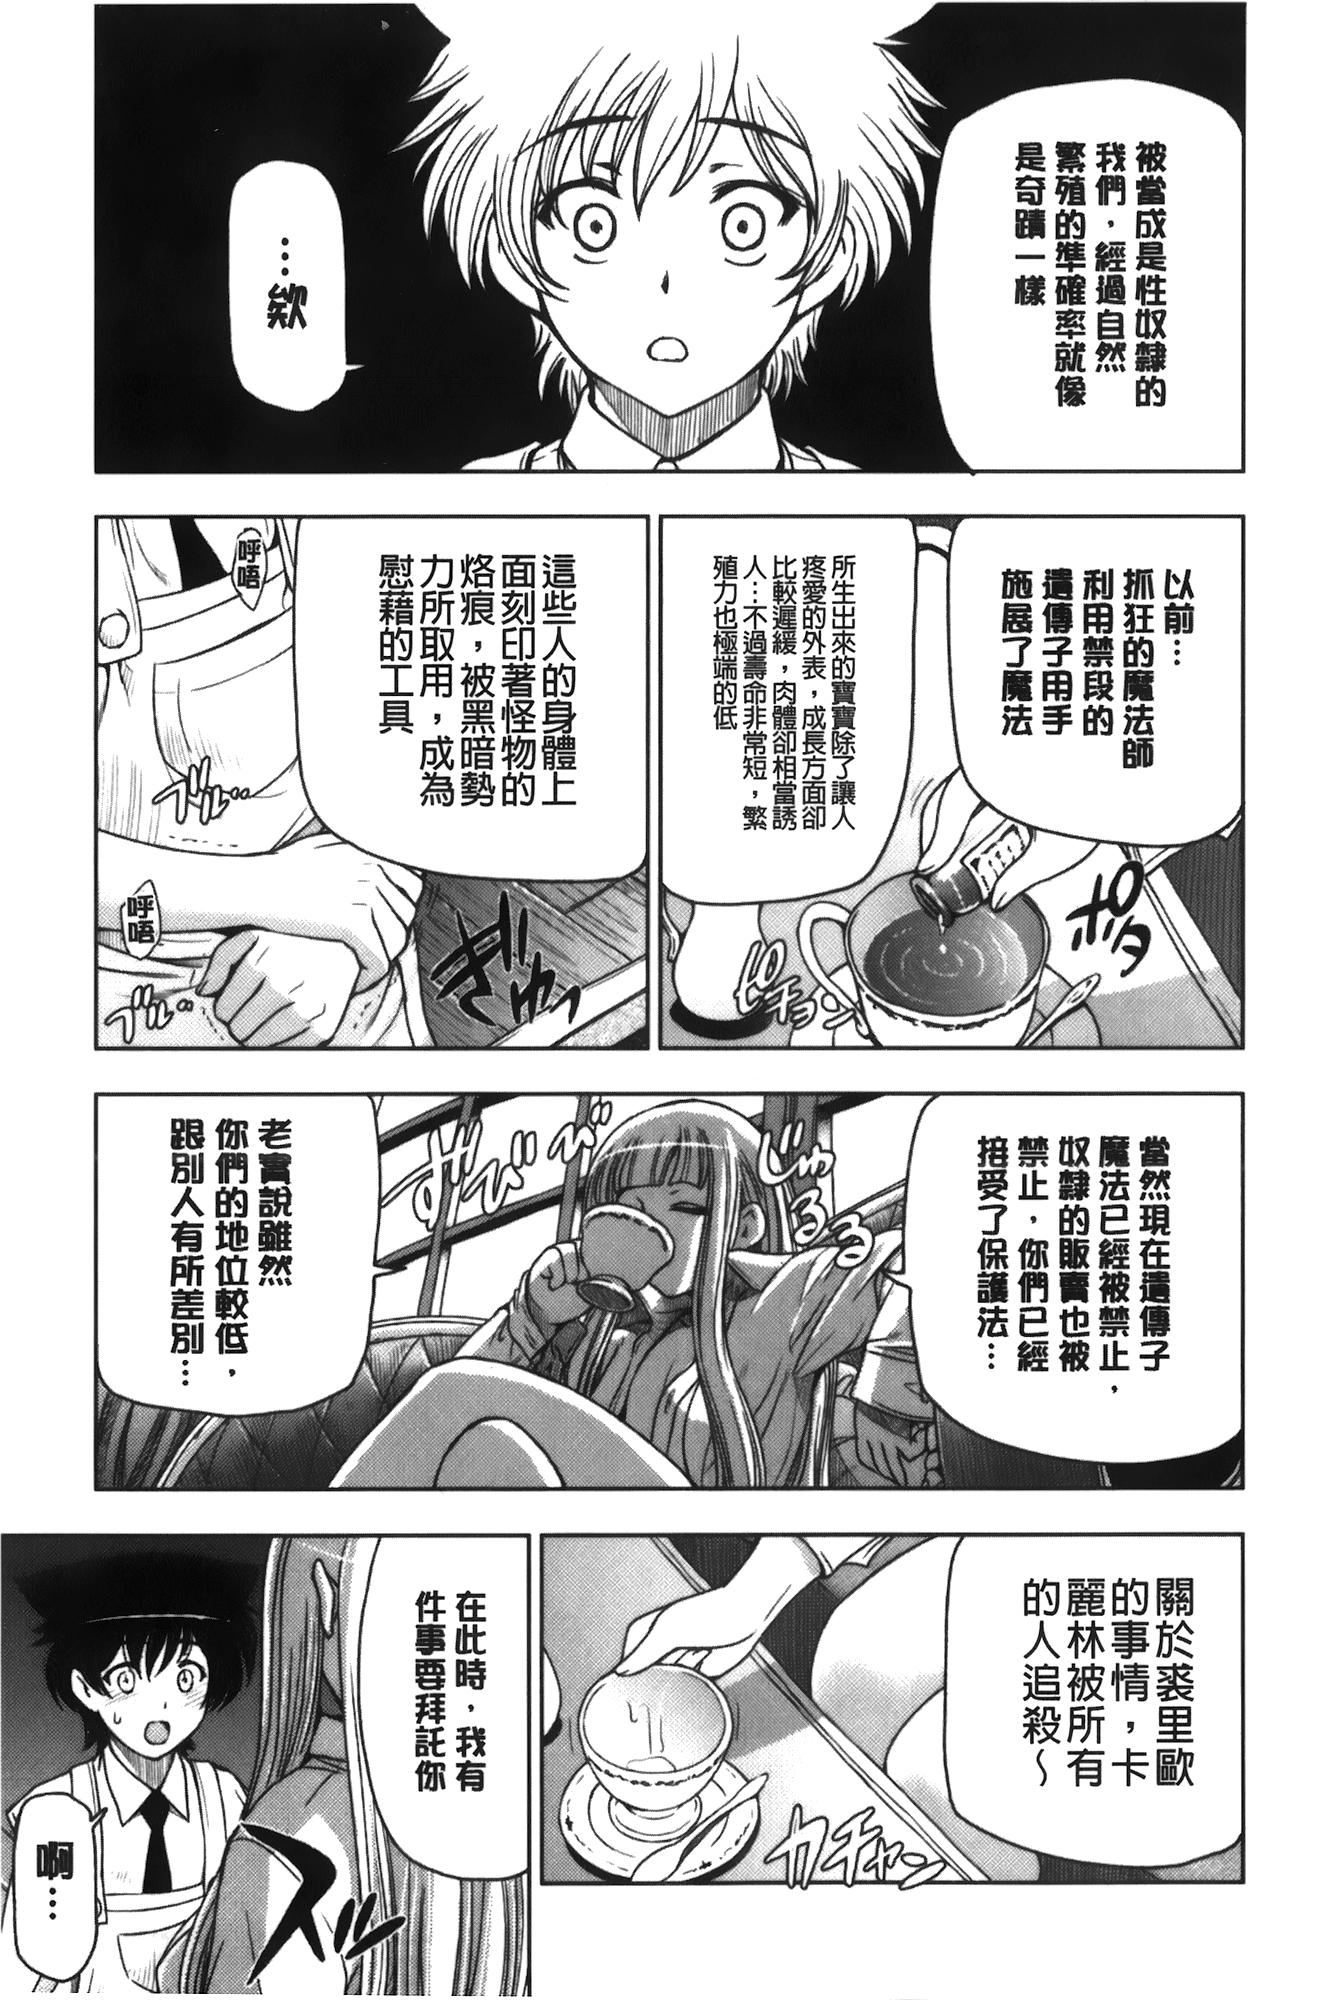 Majo × Shota ~ Genteiban | 魔女X小正太 限定版 189